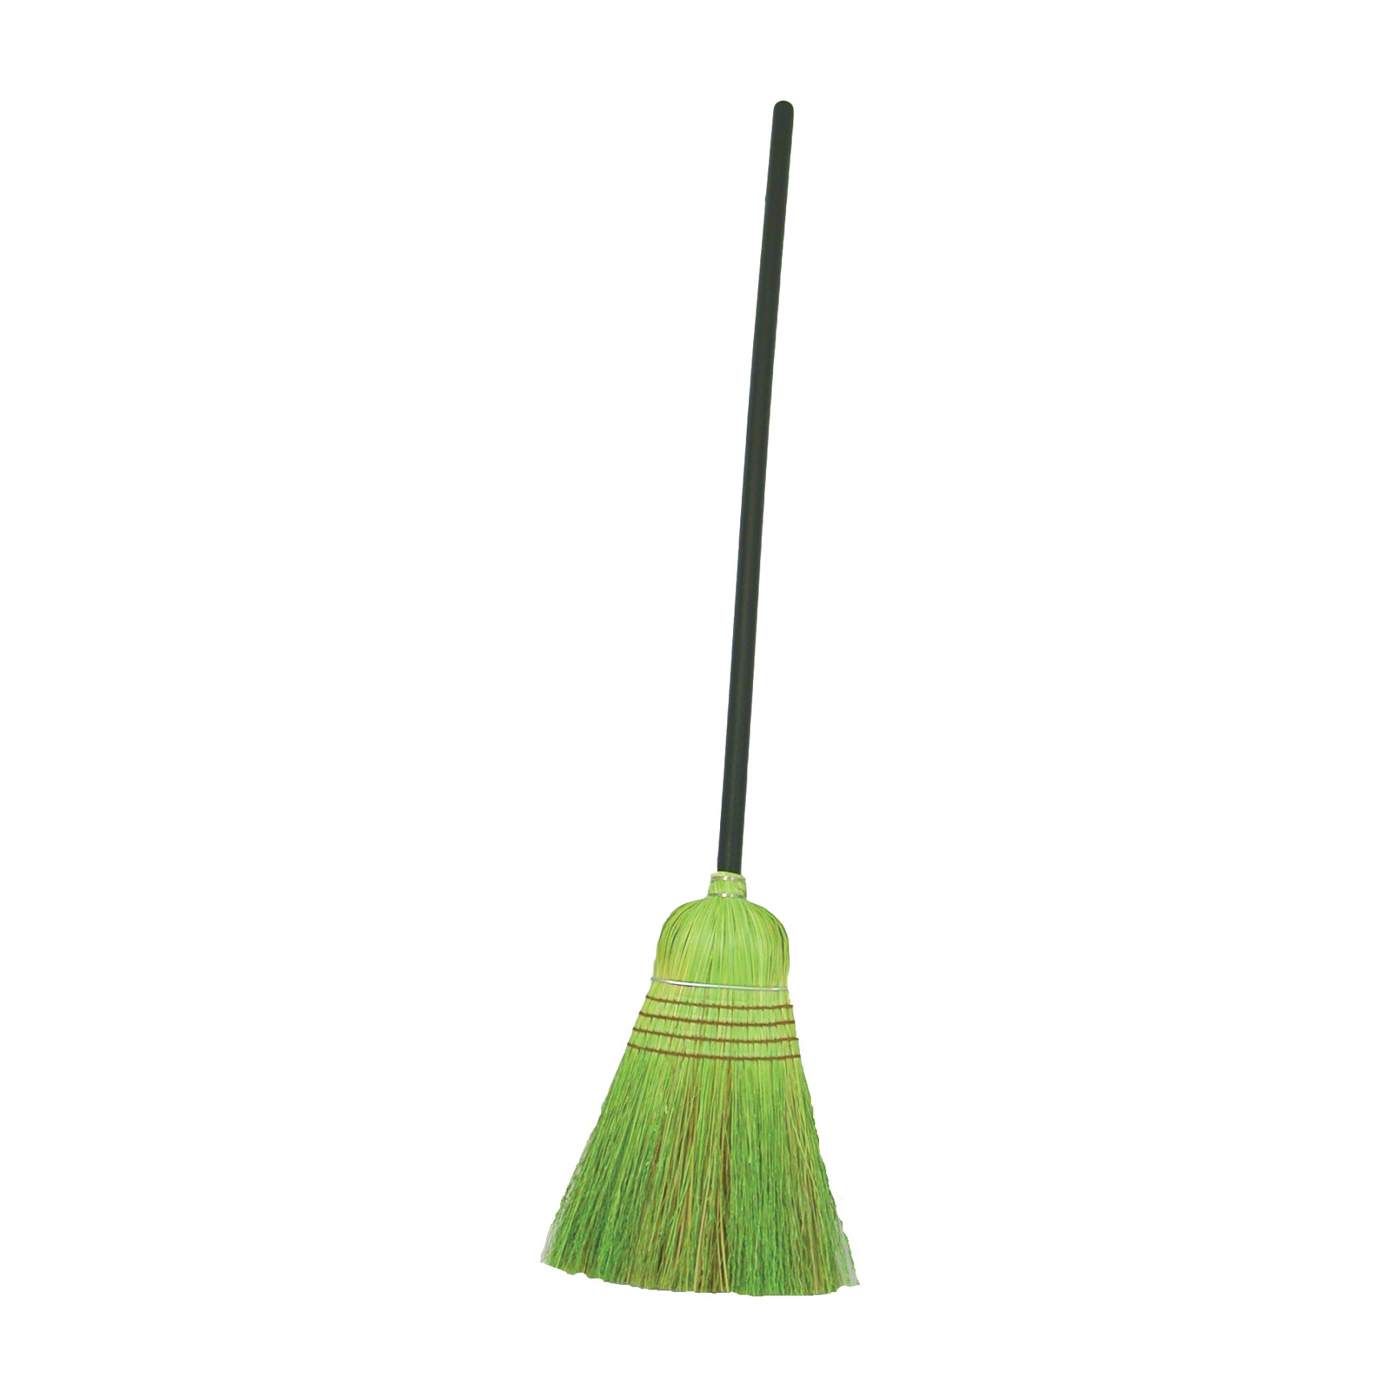 Picture of BIRDWELL 9332-4 Warehouse Broom, Sotol Fiber Bristle, Lacquered Wood Handle, Black